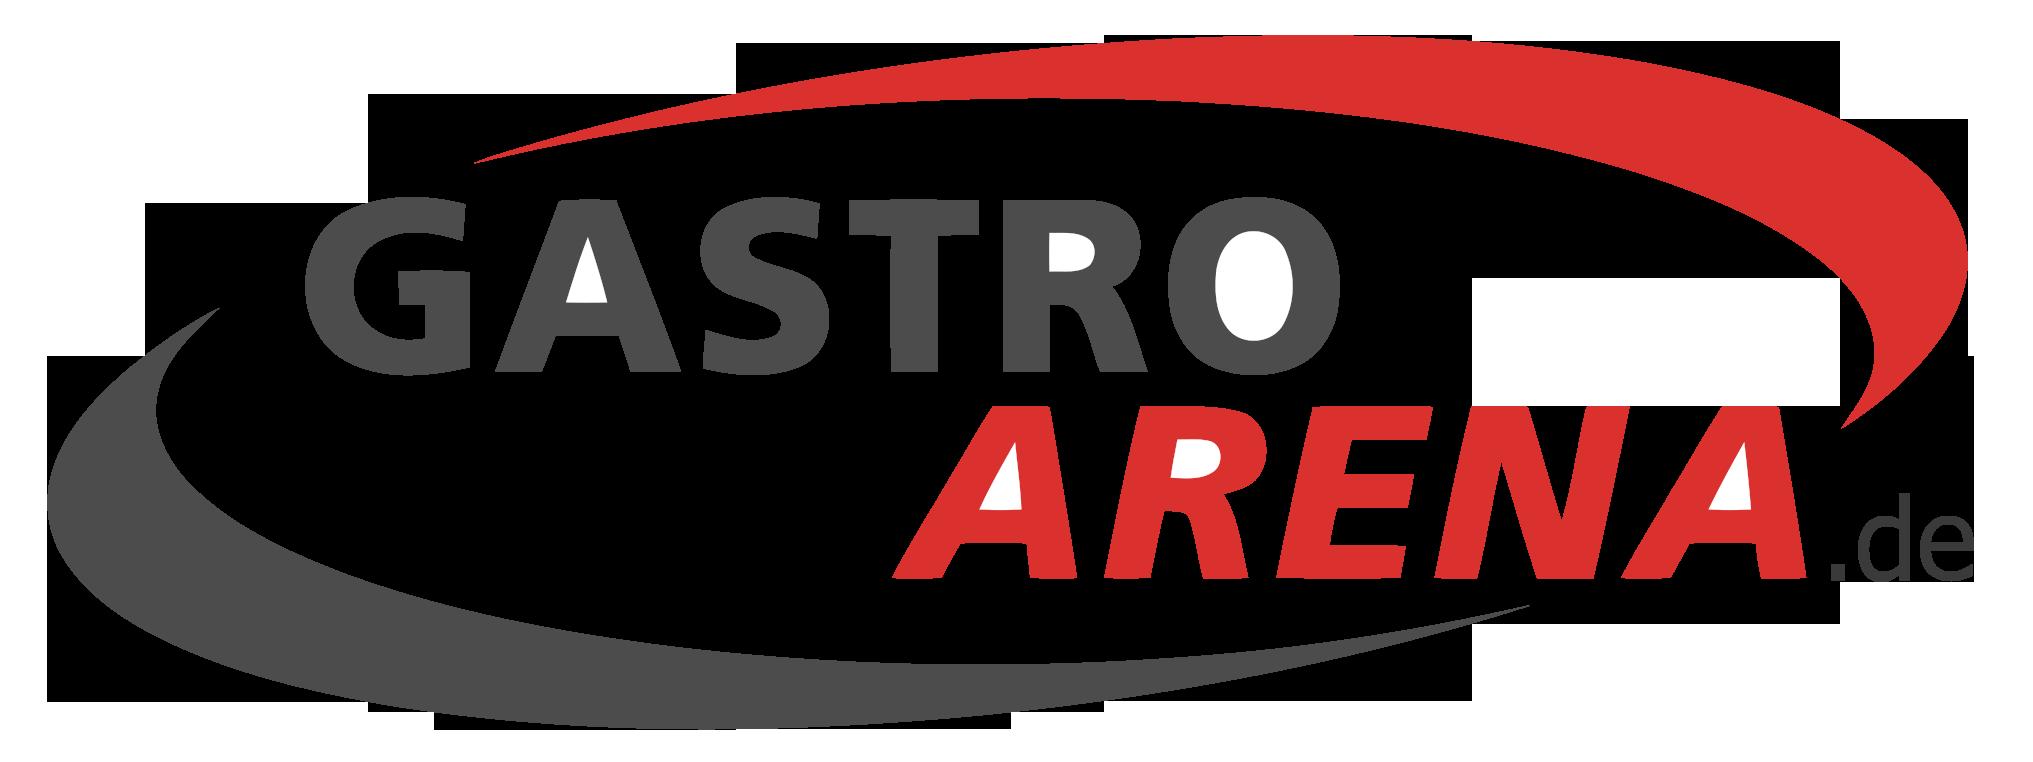 Gastro Arena Berlin